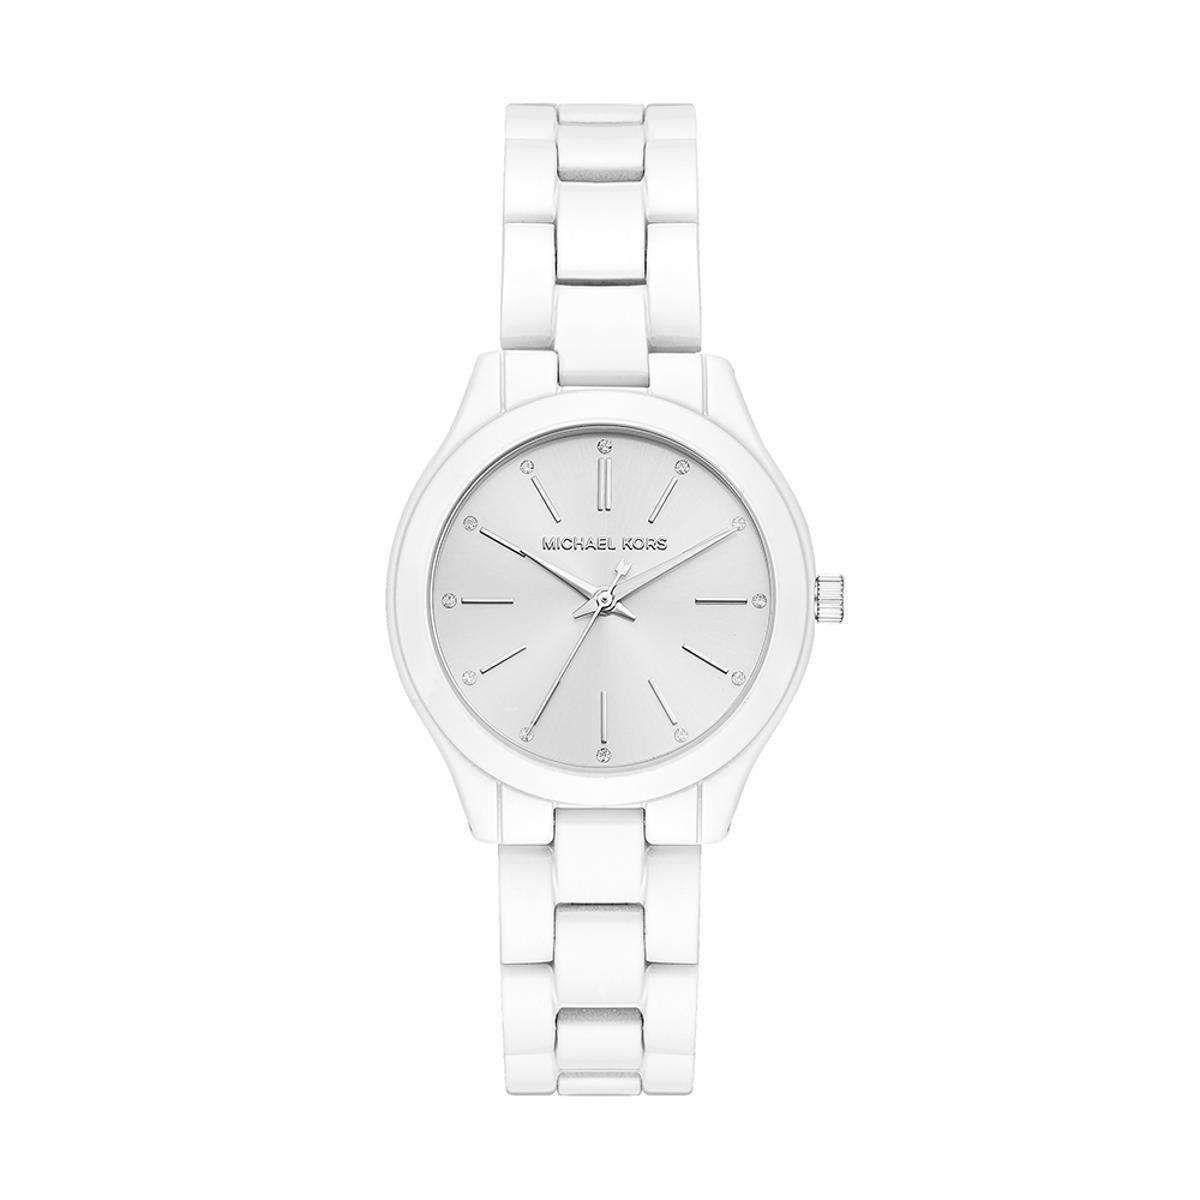 479c50c4388 Relógio Michael Kors Feminino Slim Runway - MK3908 1KN MK3908 1KN - Branco  - Compre Agora